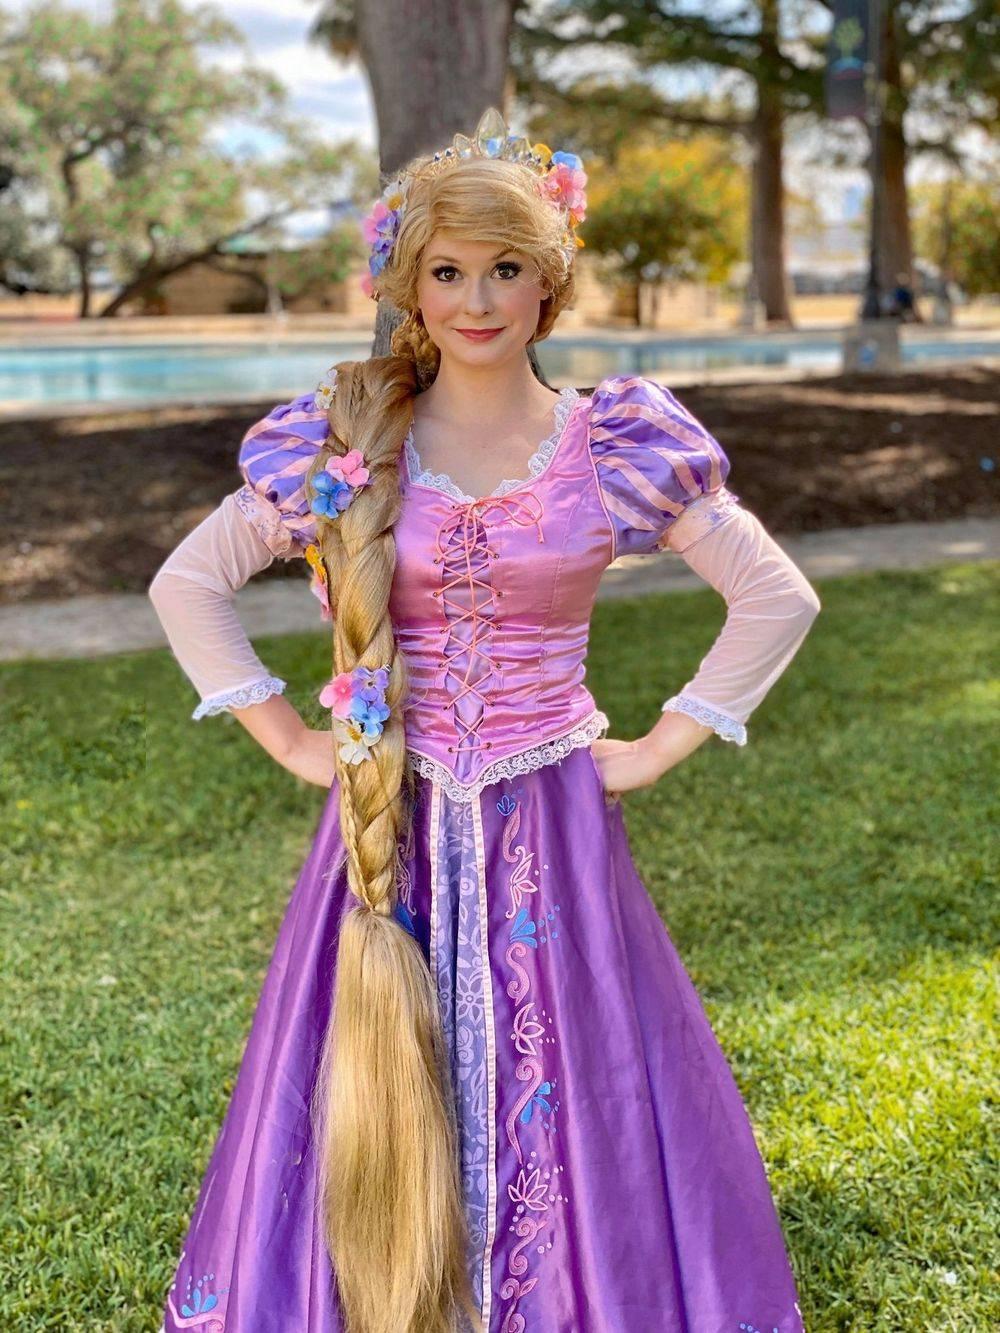 Princess Rapunzel birthday party character San Antonio